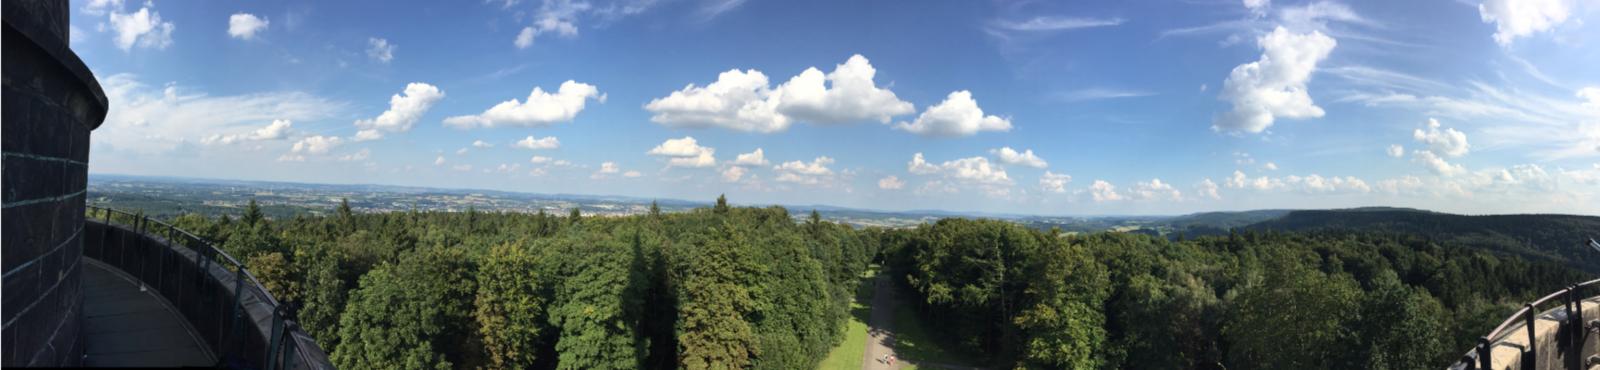 Panoramablick vom Hermannsdenkmal